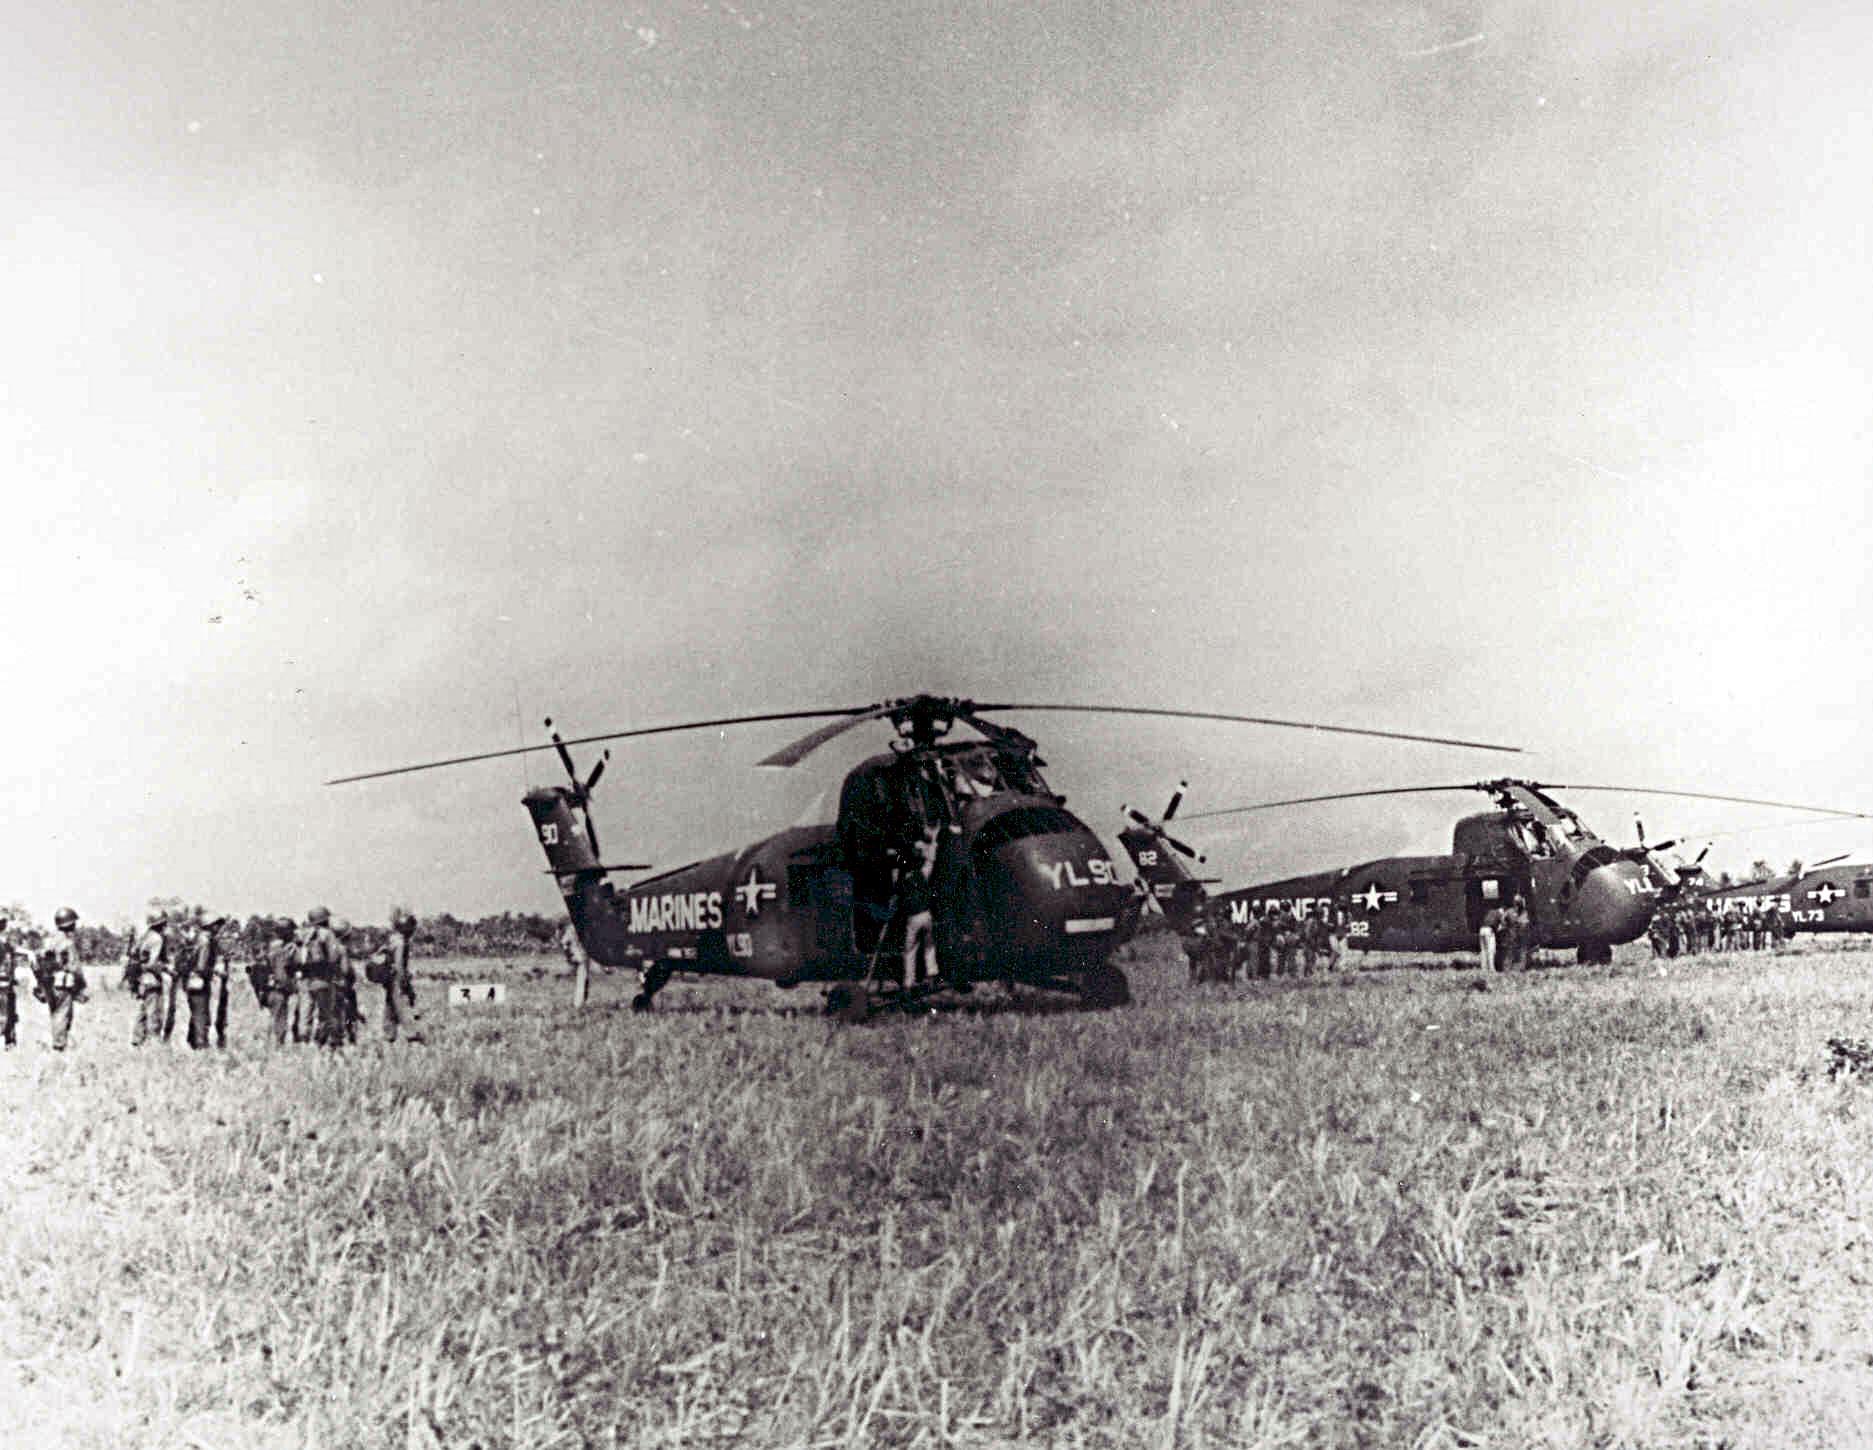 HUS-1_HMM-362_Vietnam_1962